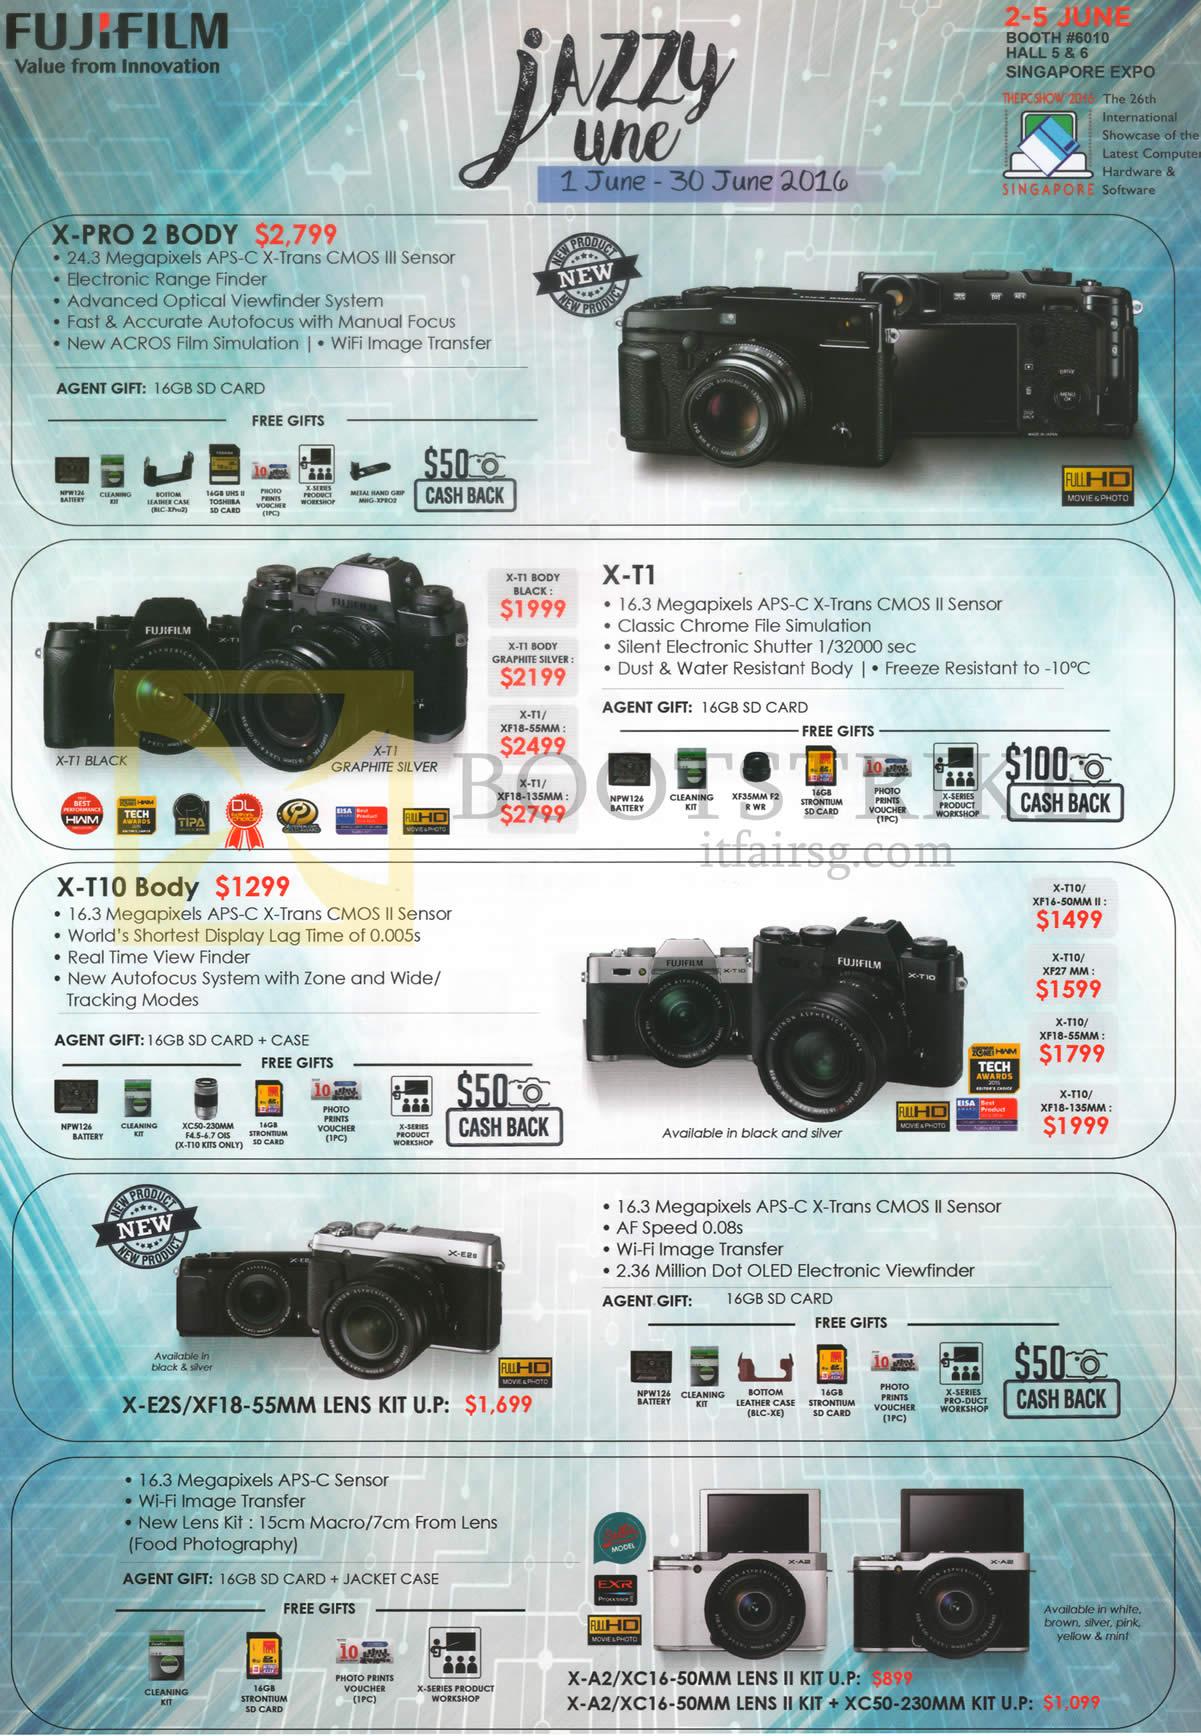 PC SHOW 2016 price list image brochure of Fujifilm Digital Cameras X Pro 2, X-T1, X-T10, X-E2S, X-A2